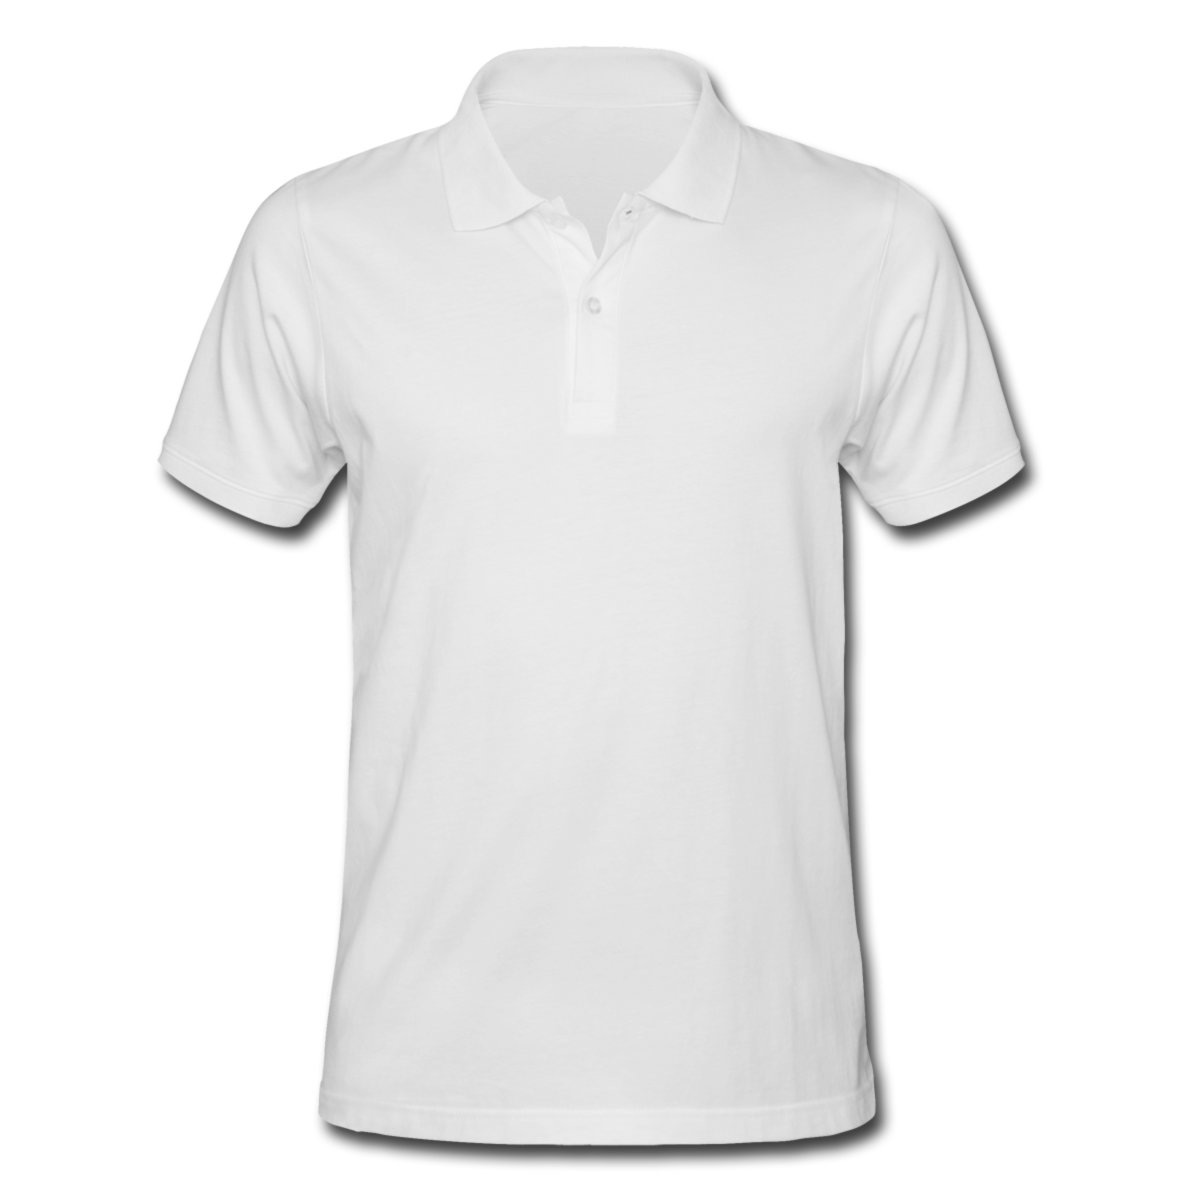 free shipping 83797 ed940 Poloshirts individuell bedrucken - Herren Poloshirt mit Druck